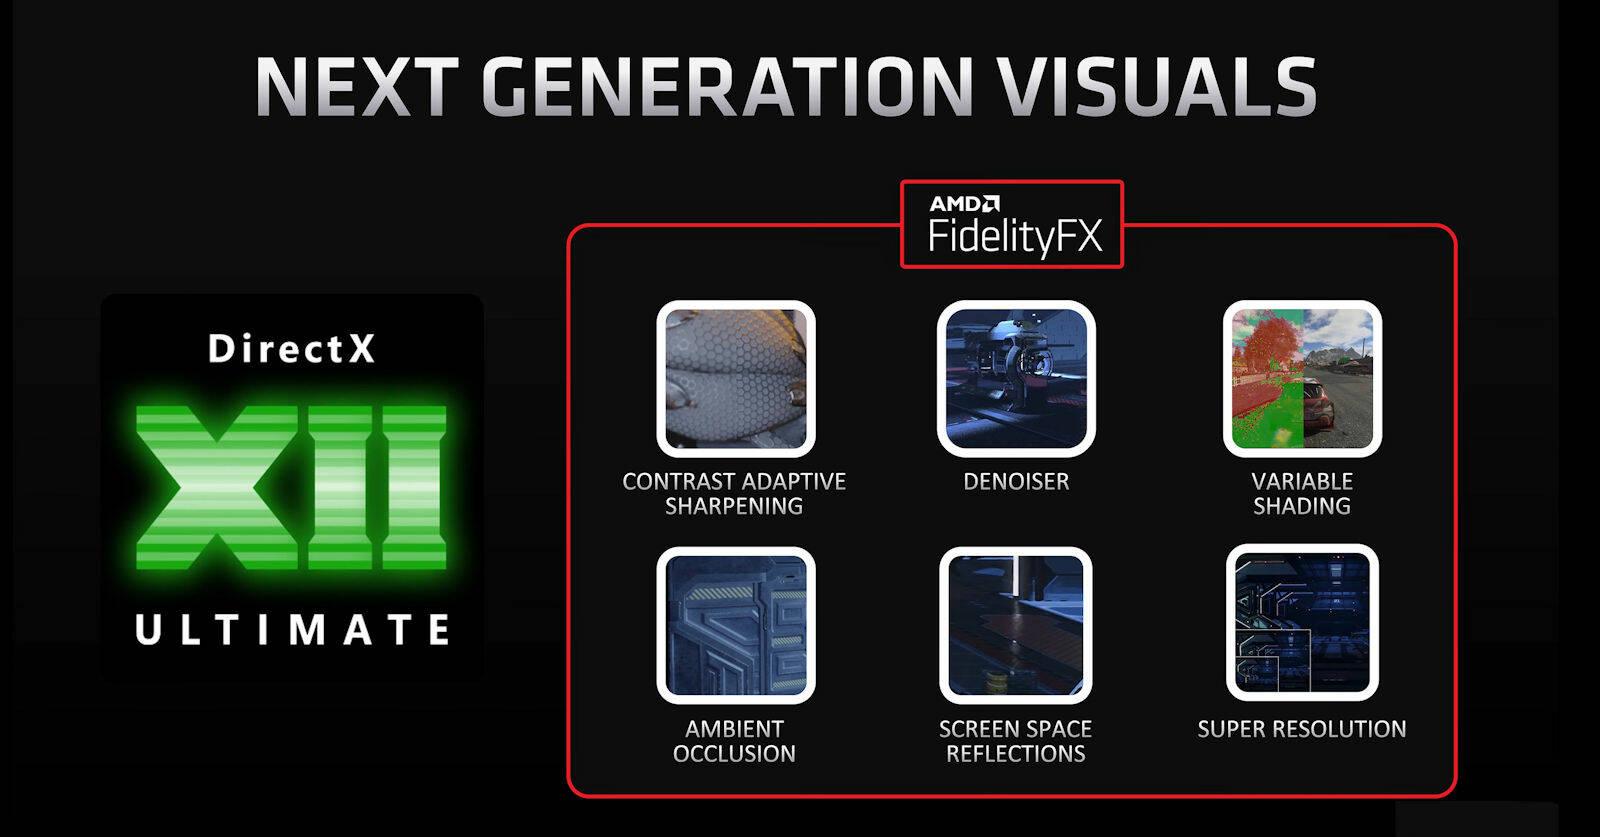 AMD FidelityFX DirectX